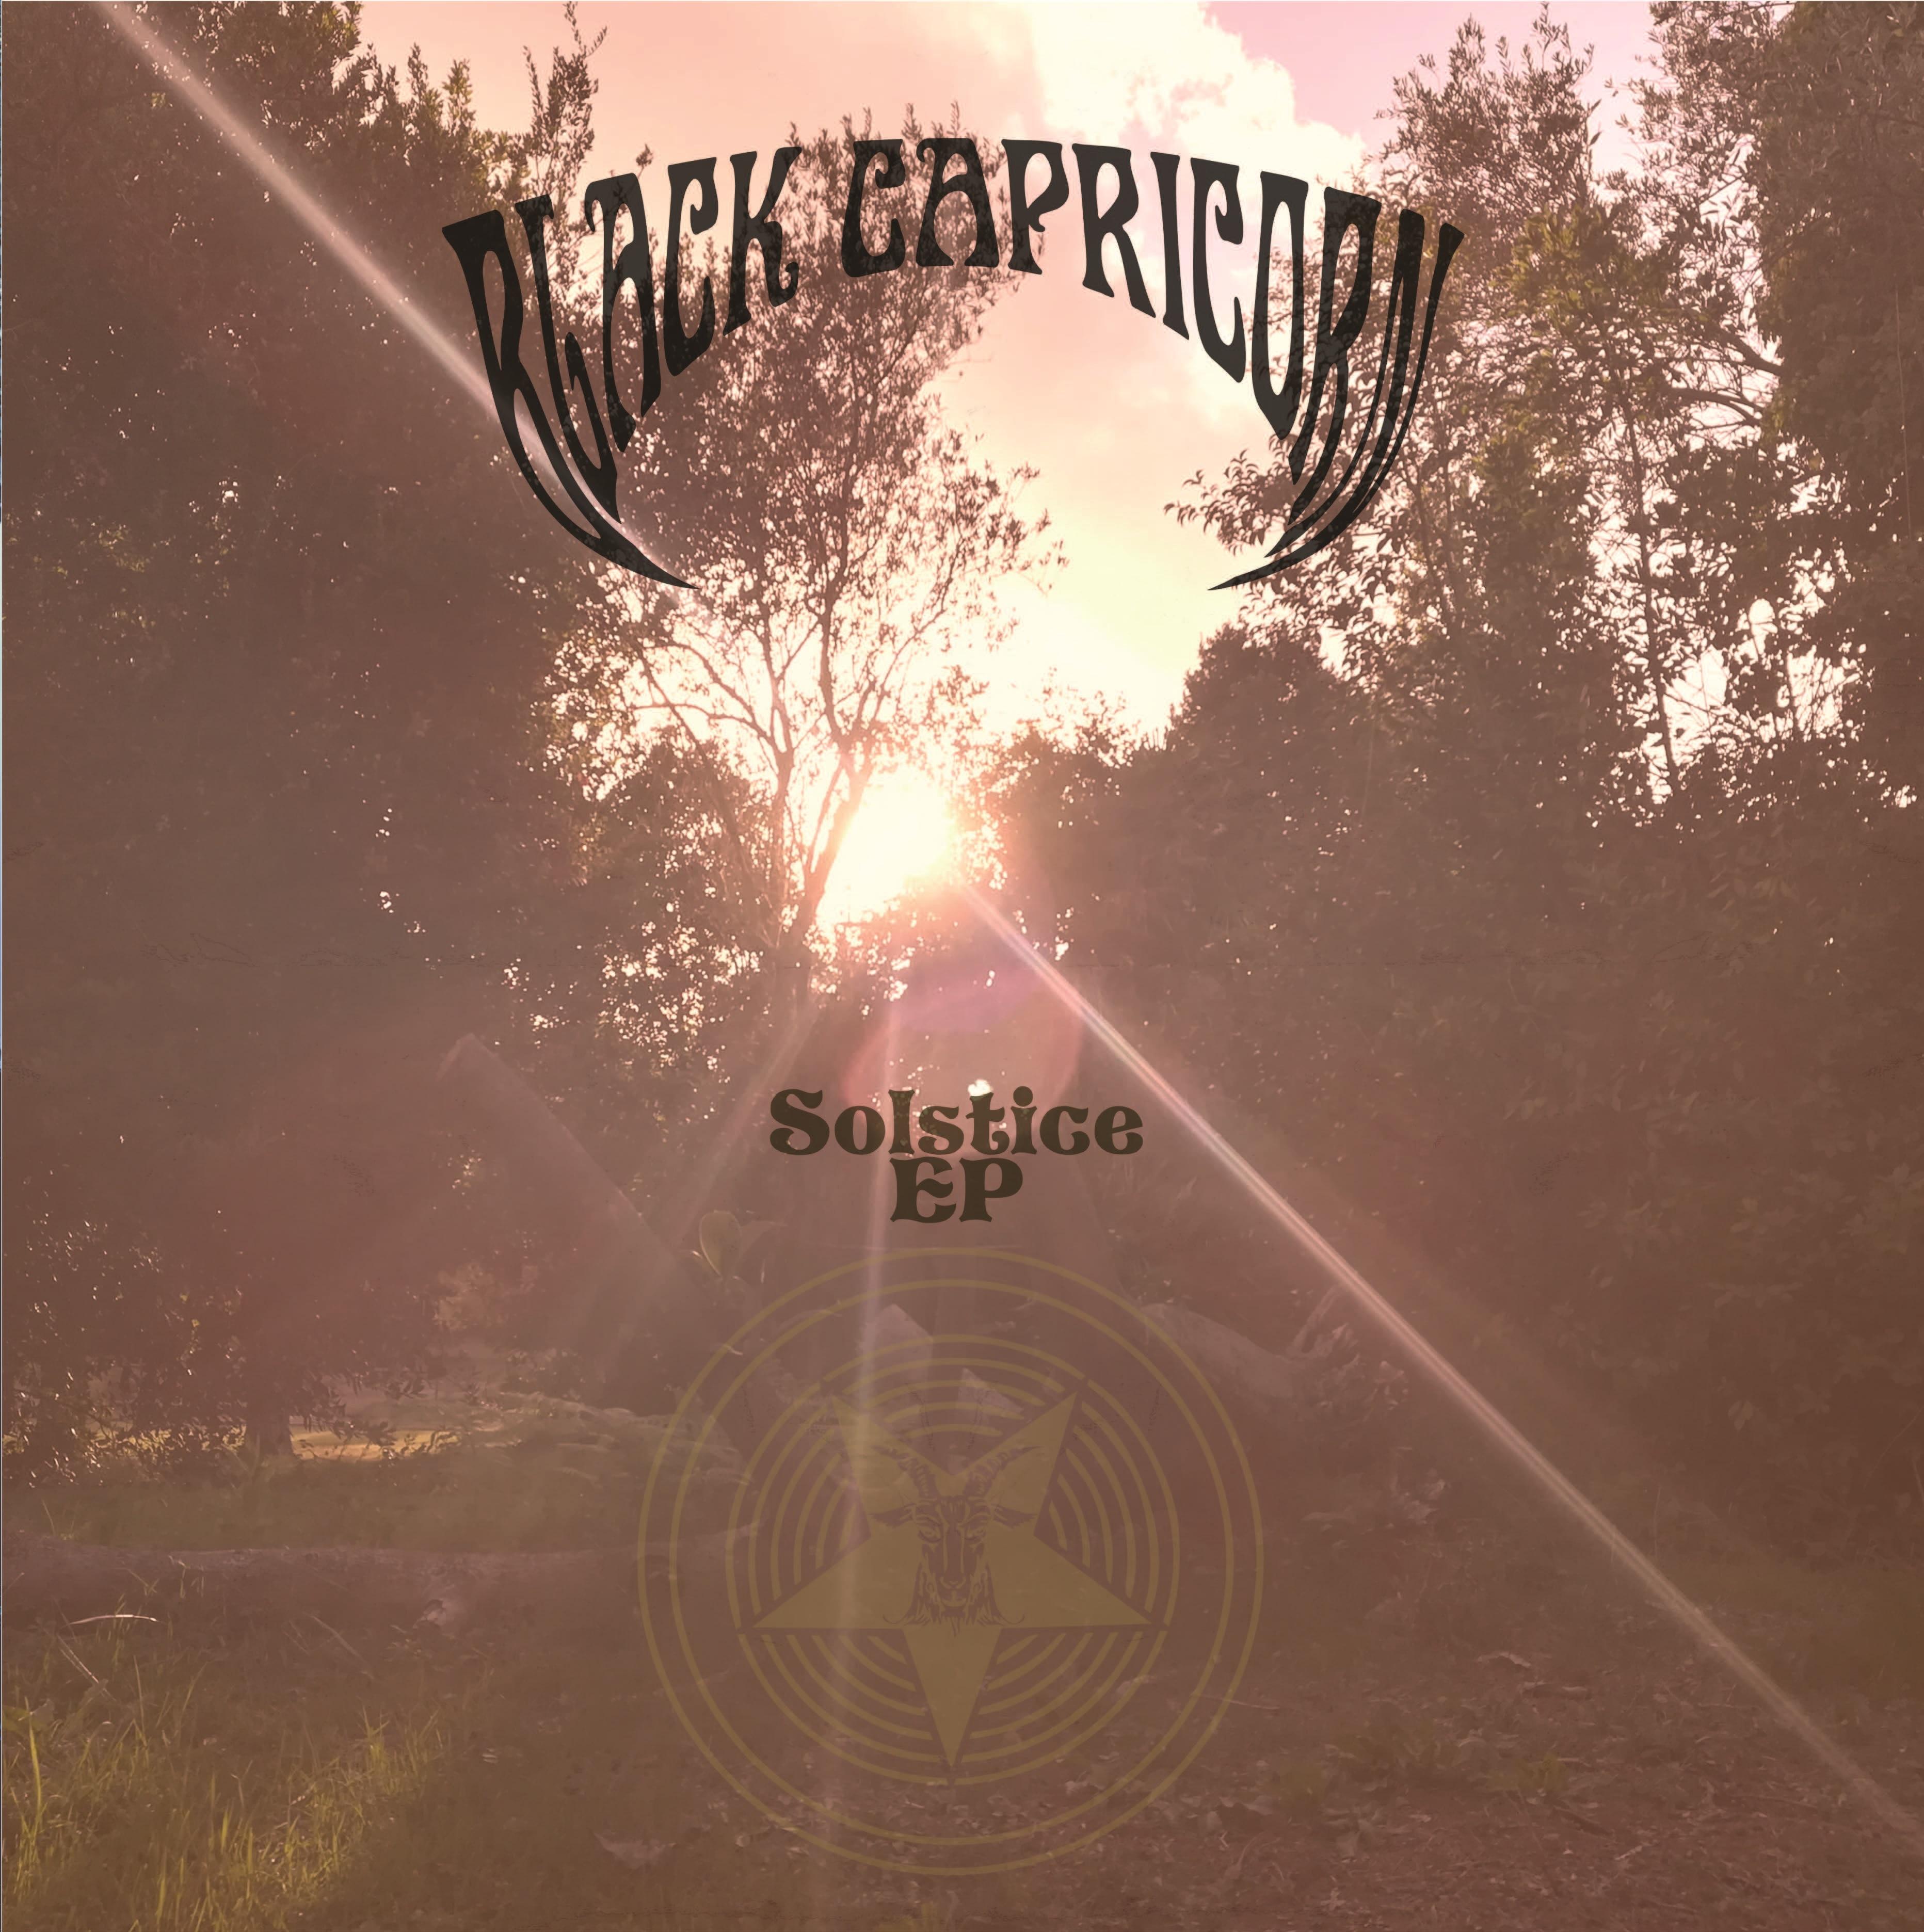 black capricorn solstice ep